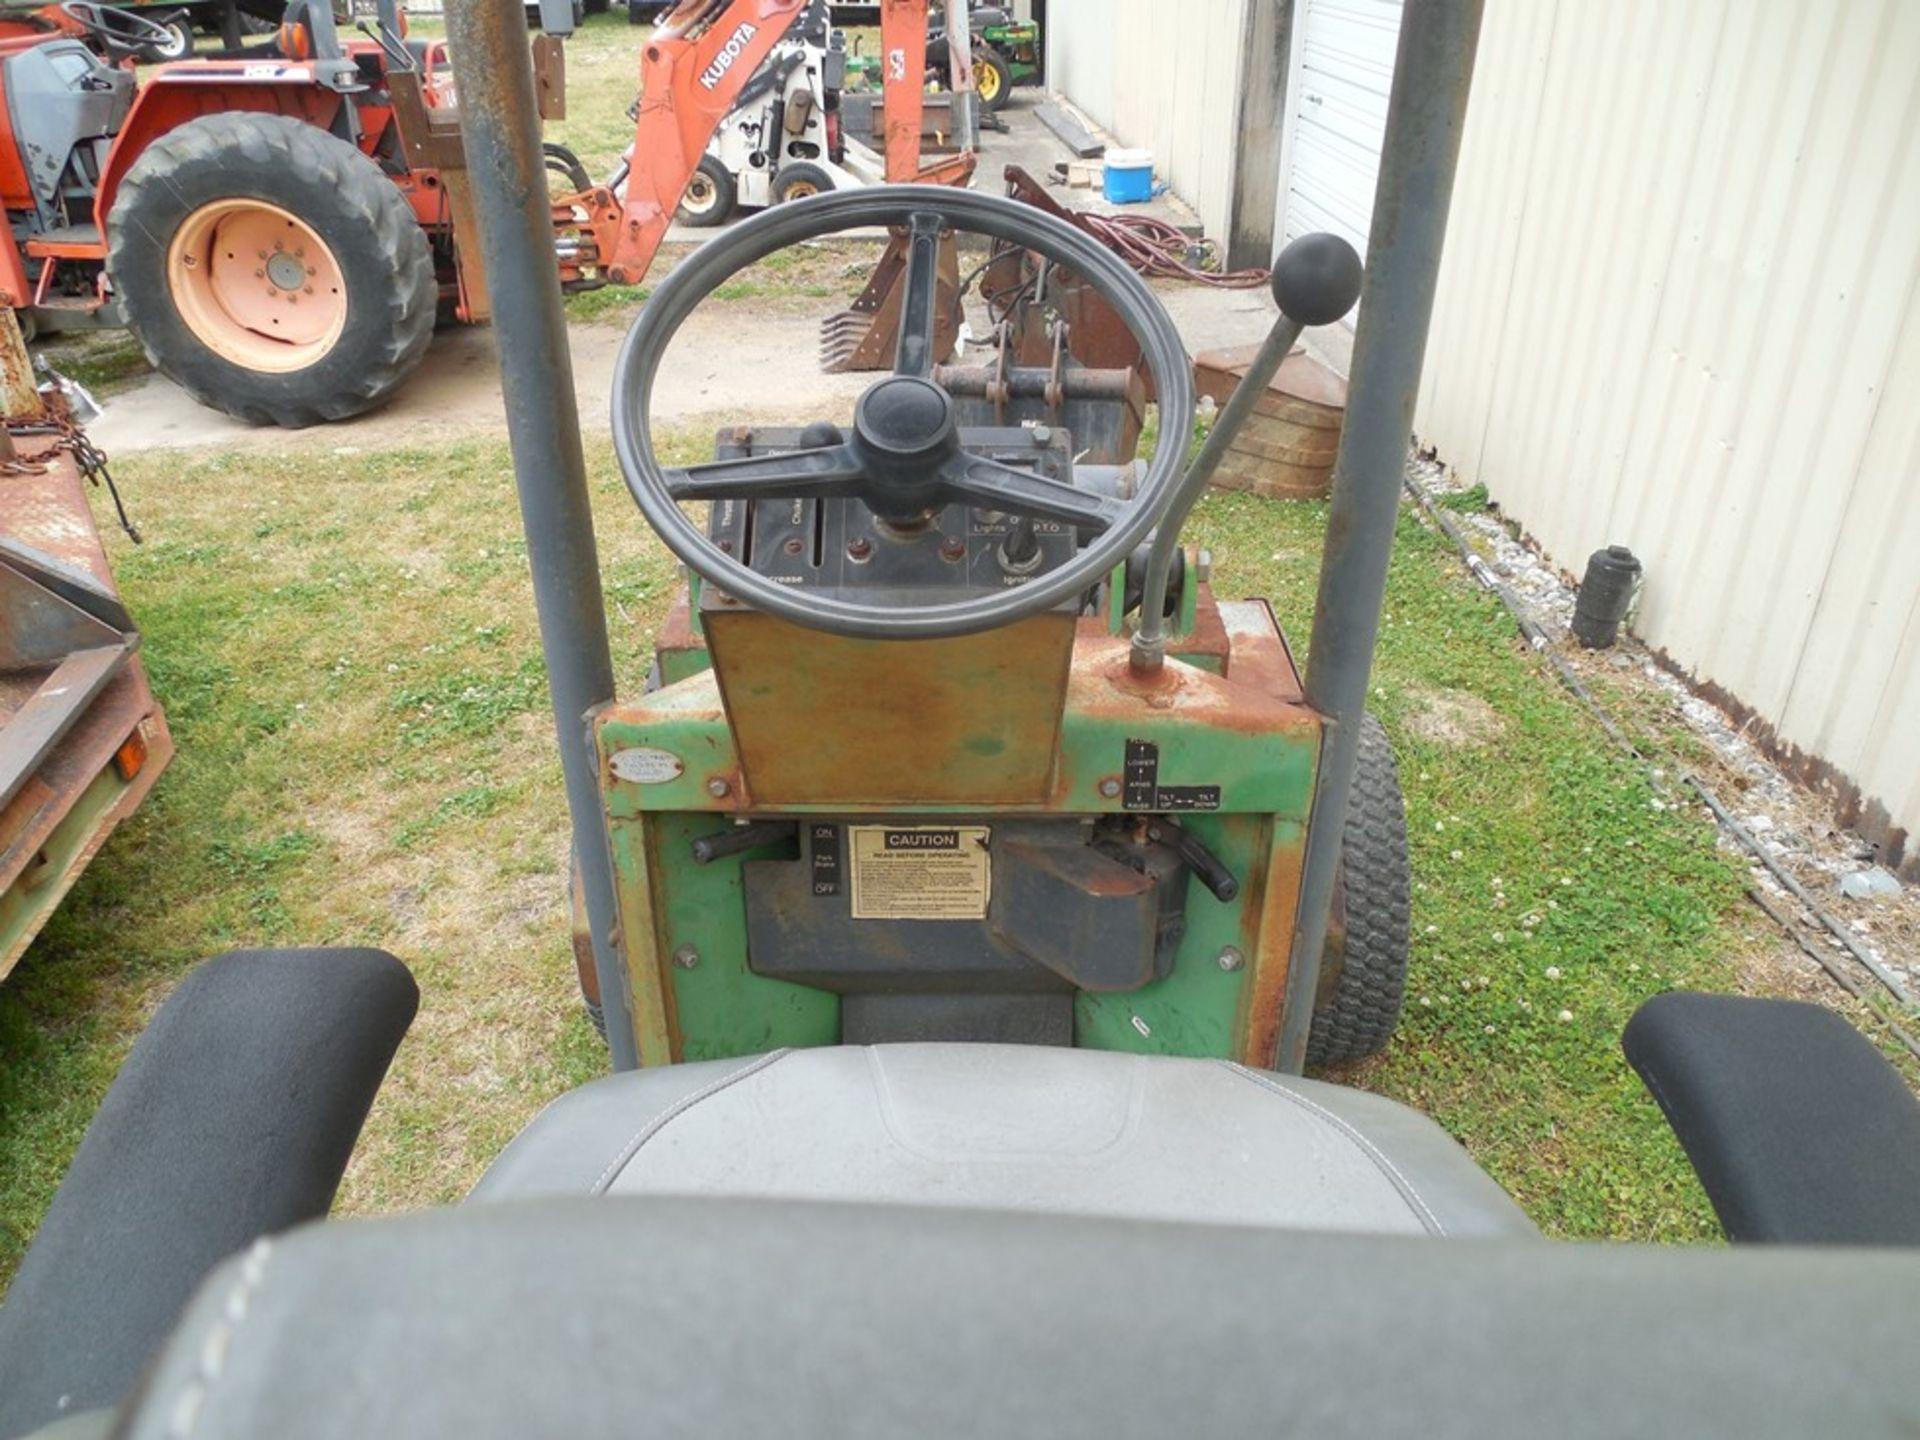 Power Trac PT-2425 Mini Skid Steer ser# 18928 with trailer, power rake, tree spade, front bucket, - Image 6 of 13